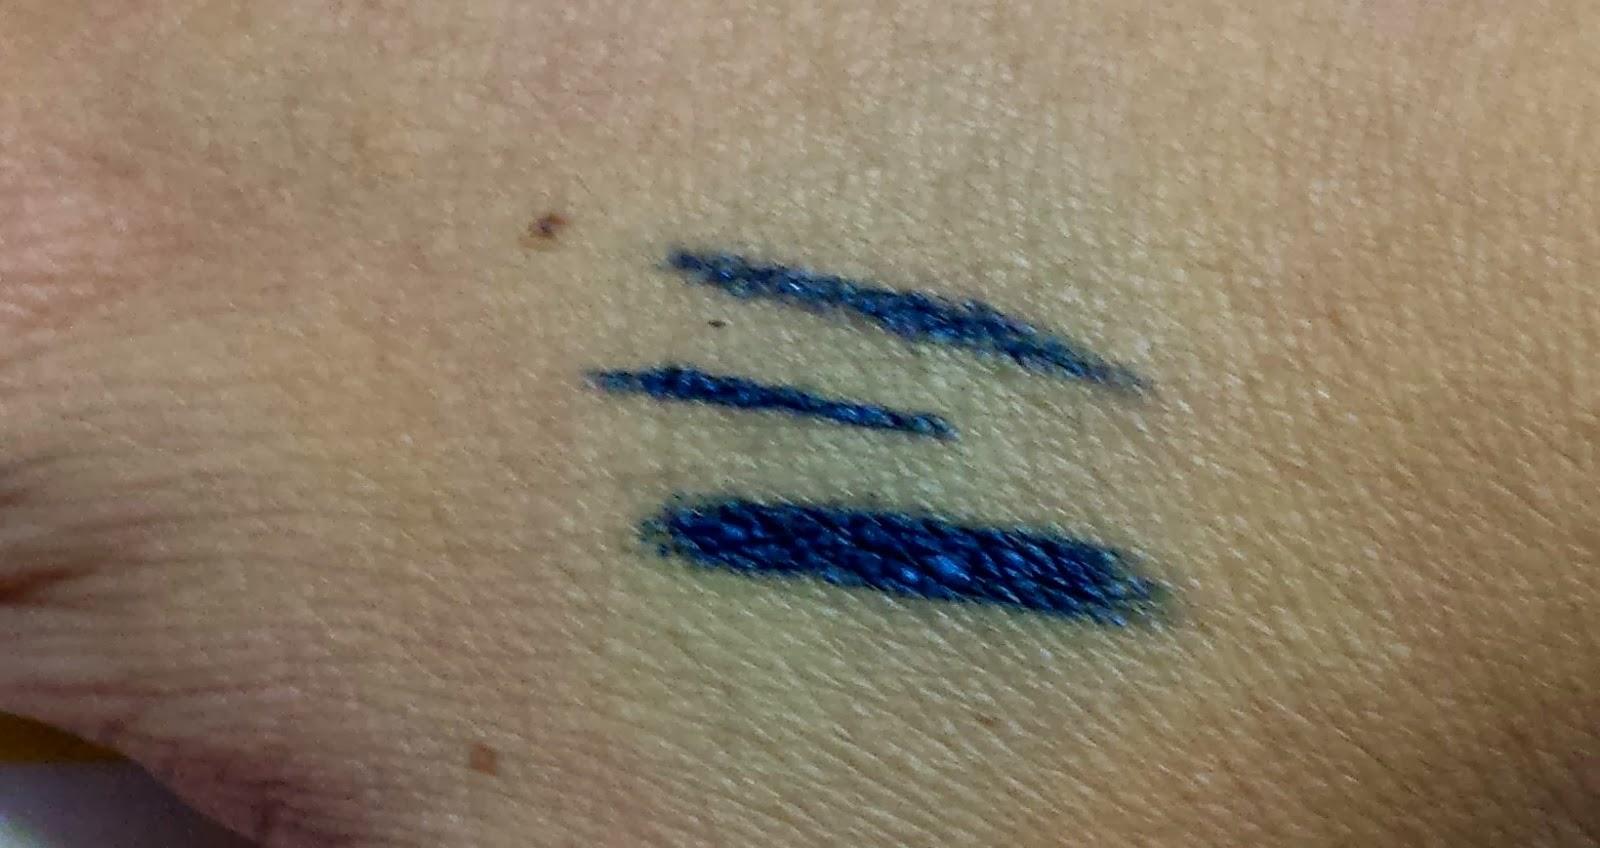 Exact Eyelights Eye Brightening Liner by Covergirl #5